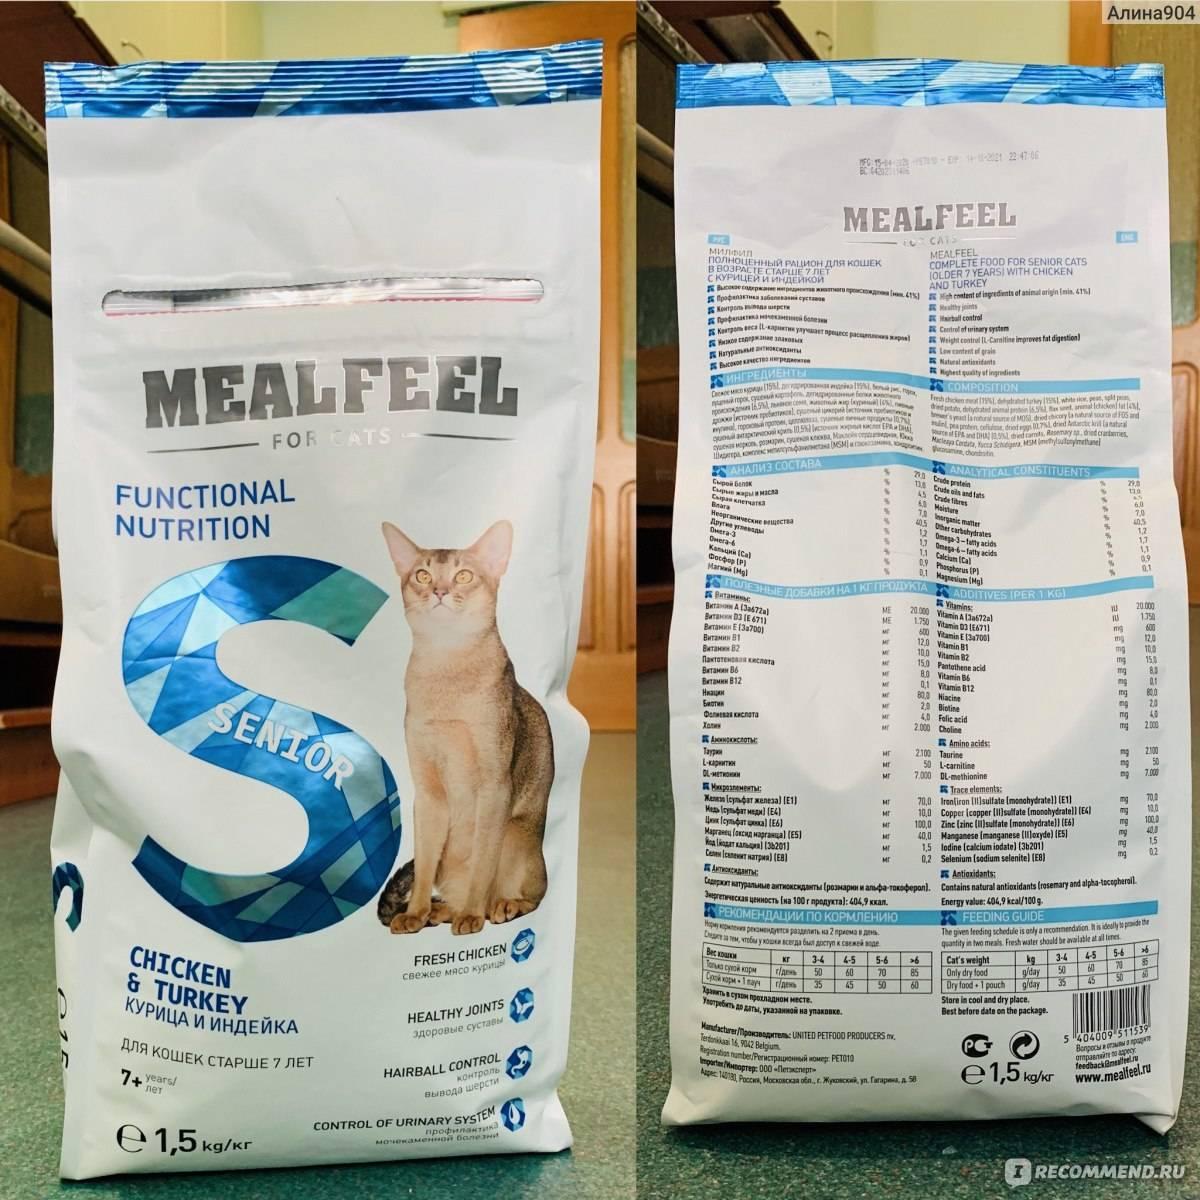 Mealfeel cat sterilized lamb - рейтинг, обзор корма, сравнение и анализ mealfeel cat sterilized lamb, состав и описание корма, плюсы и минусы mealfeel cat sterilized lamb, отзывы о корме, характеристика и дозировка